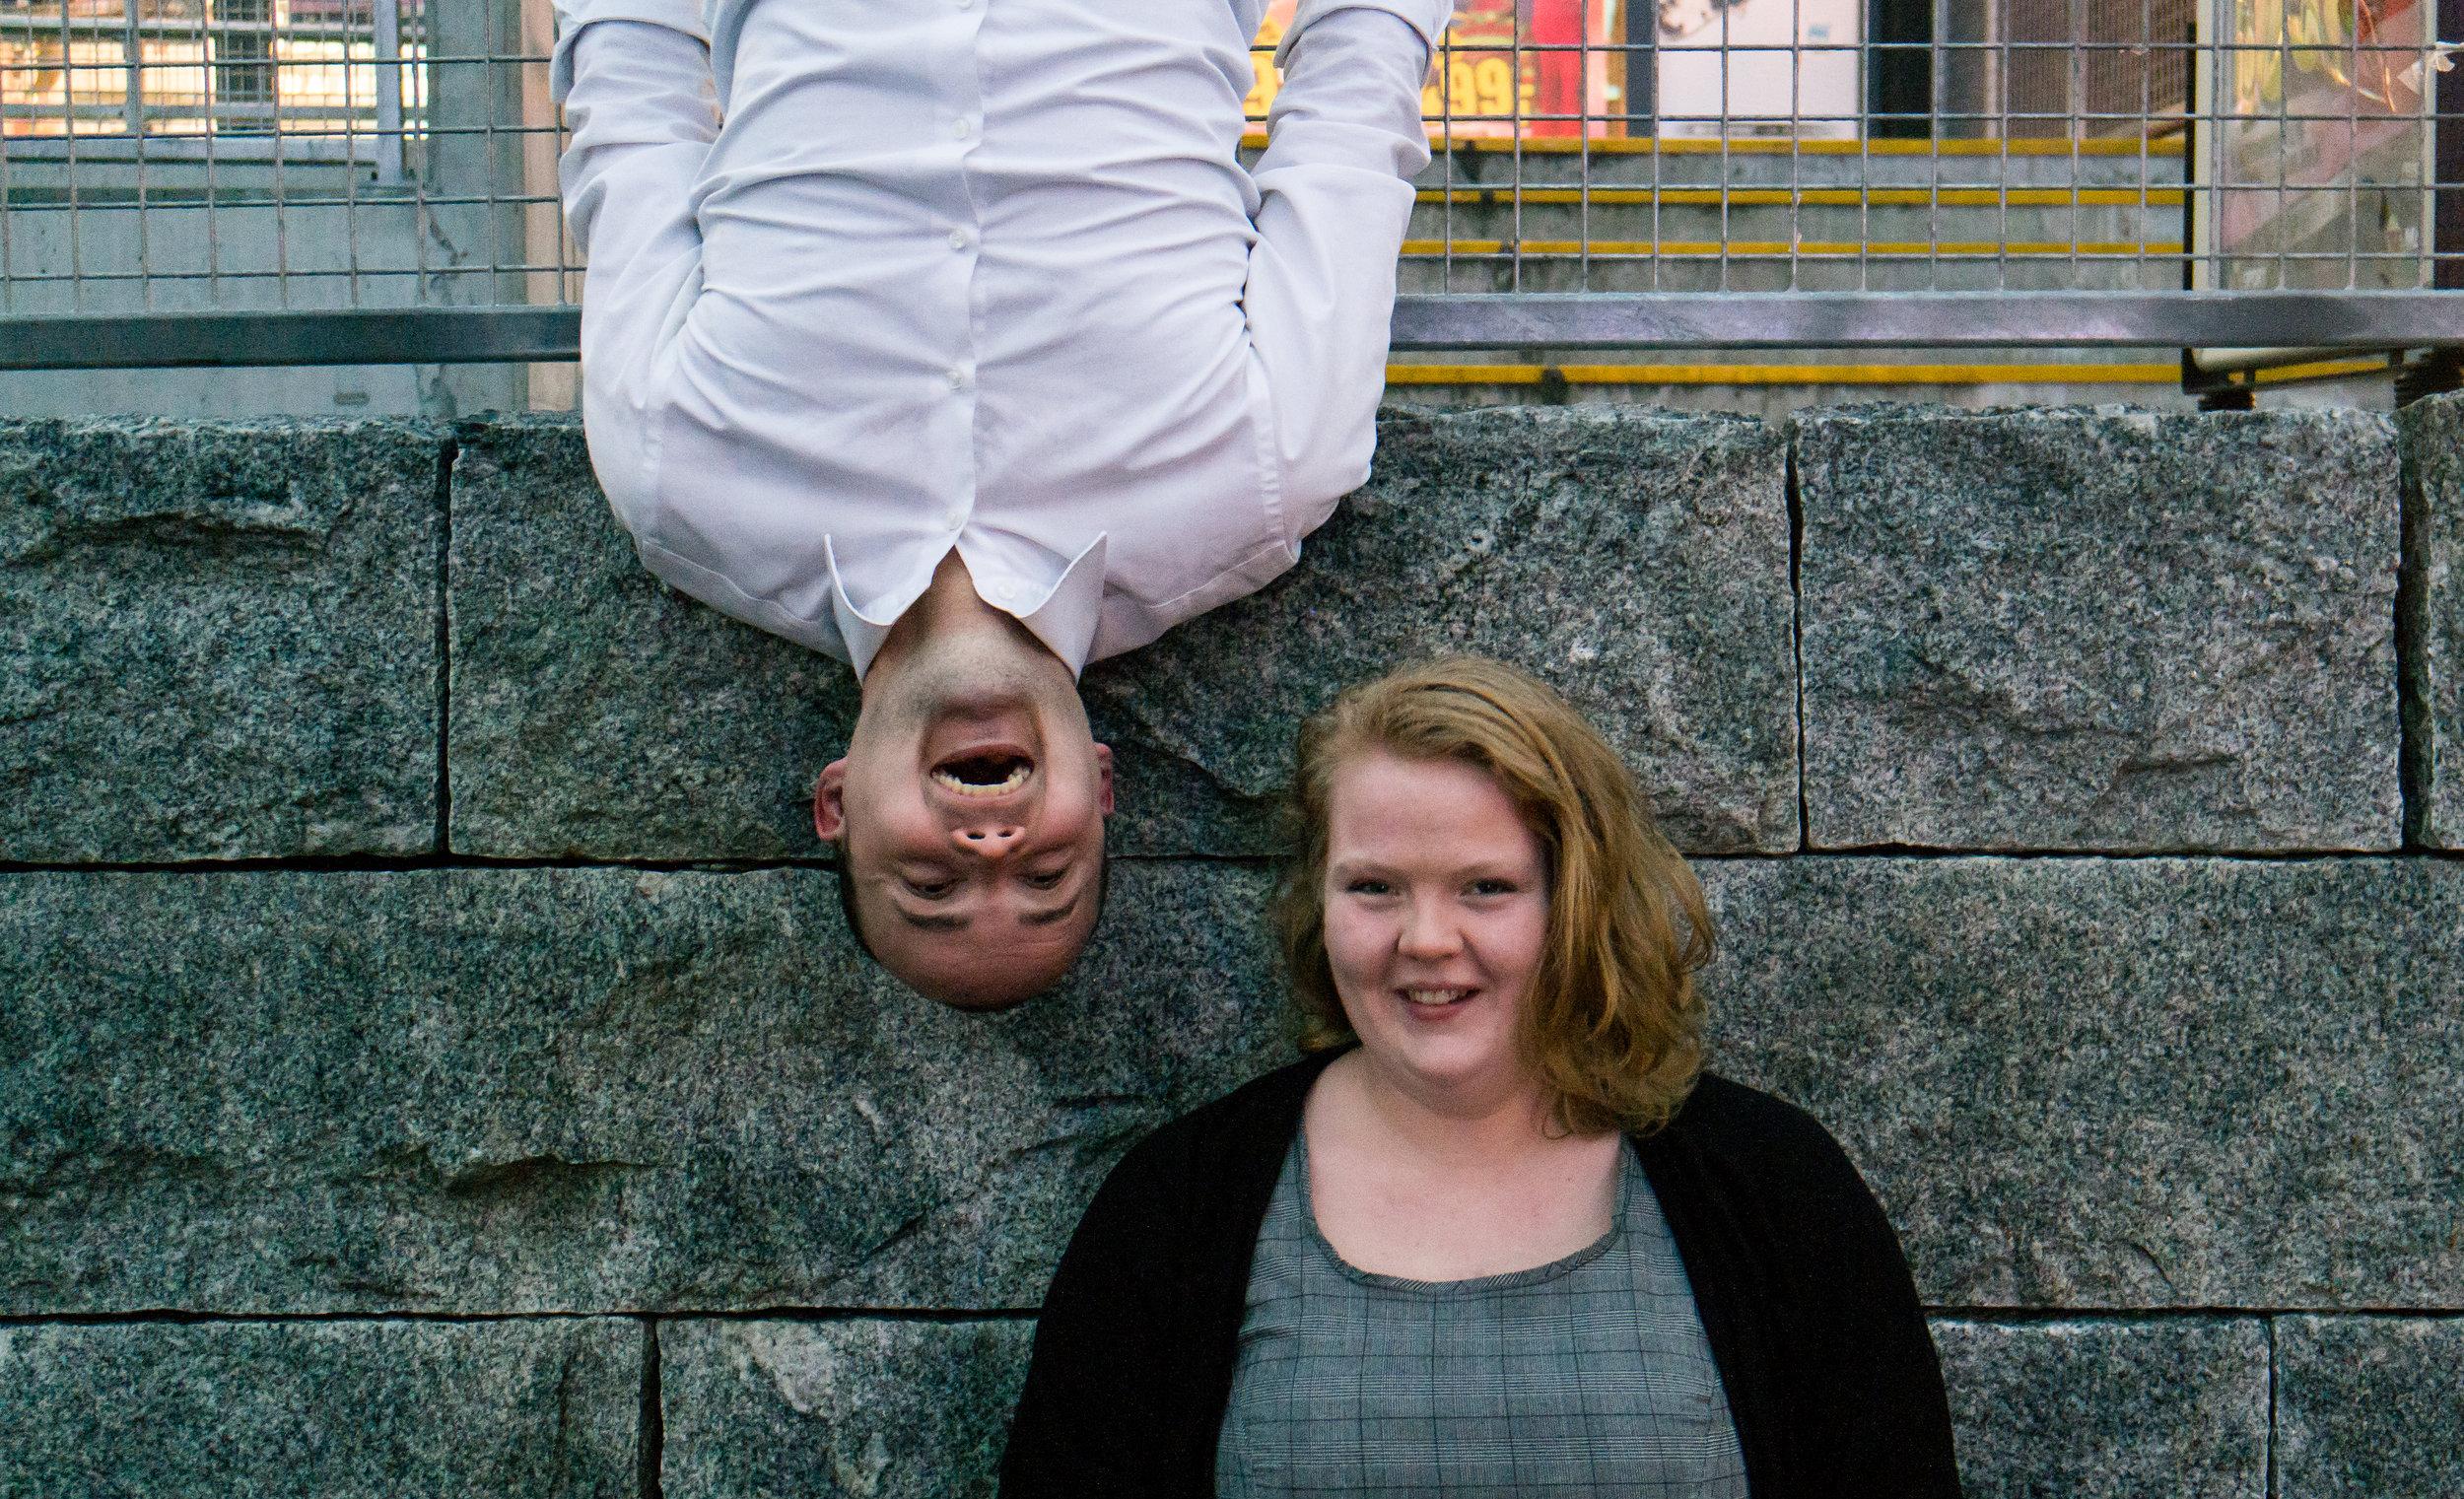 Skrål og Skrammel Fotograf Kato Andersen.jpg